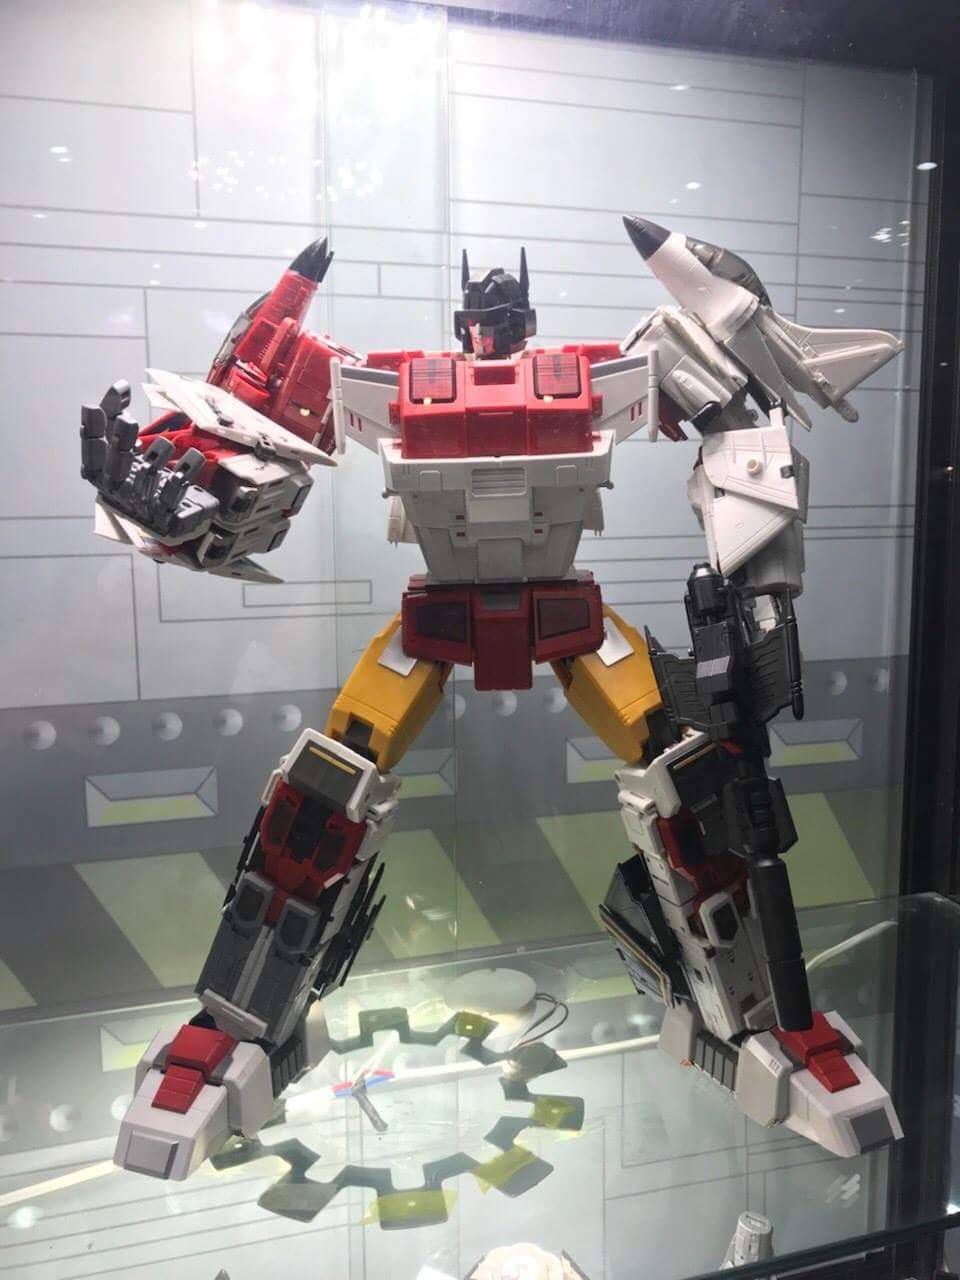 [Zeta Toys] Produit Tiers ― Kronos (ZB-01 à ZB-05) ― ZB-06 ZB-07 Superitron ― aka Superion - Page 3 JYn4XS4R_o